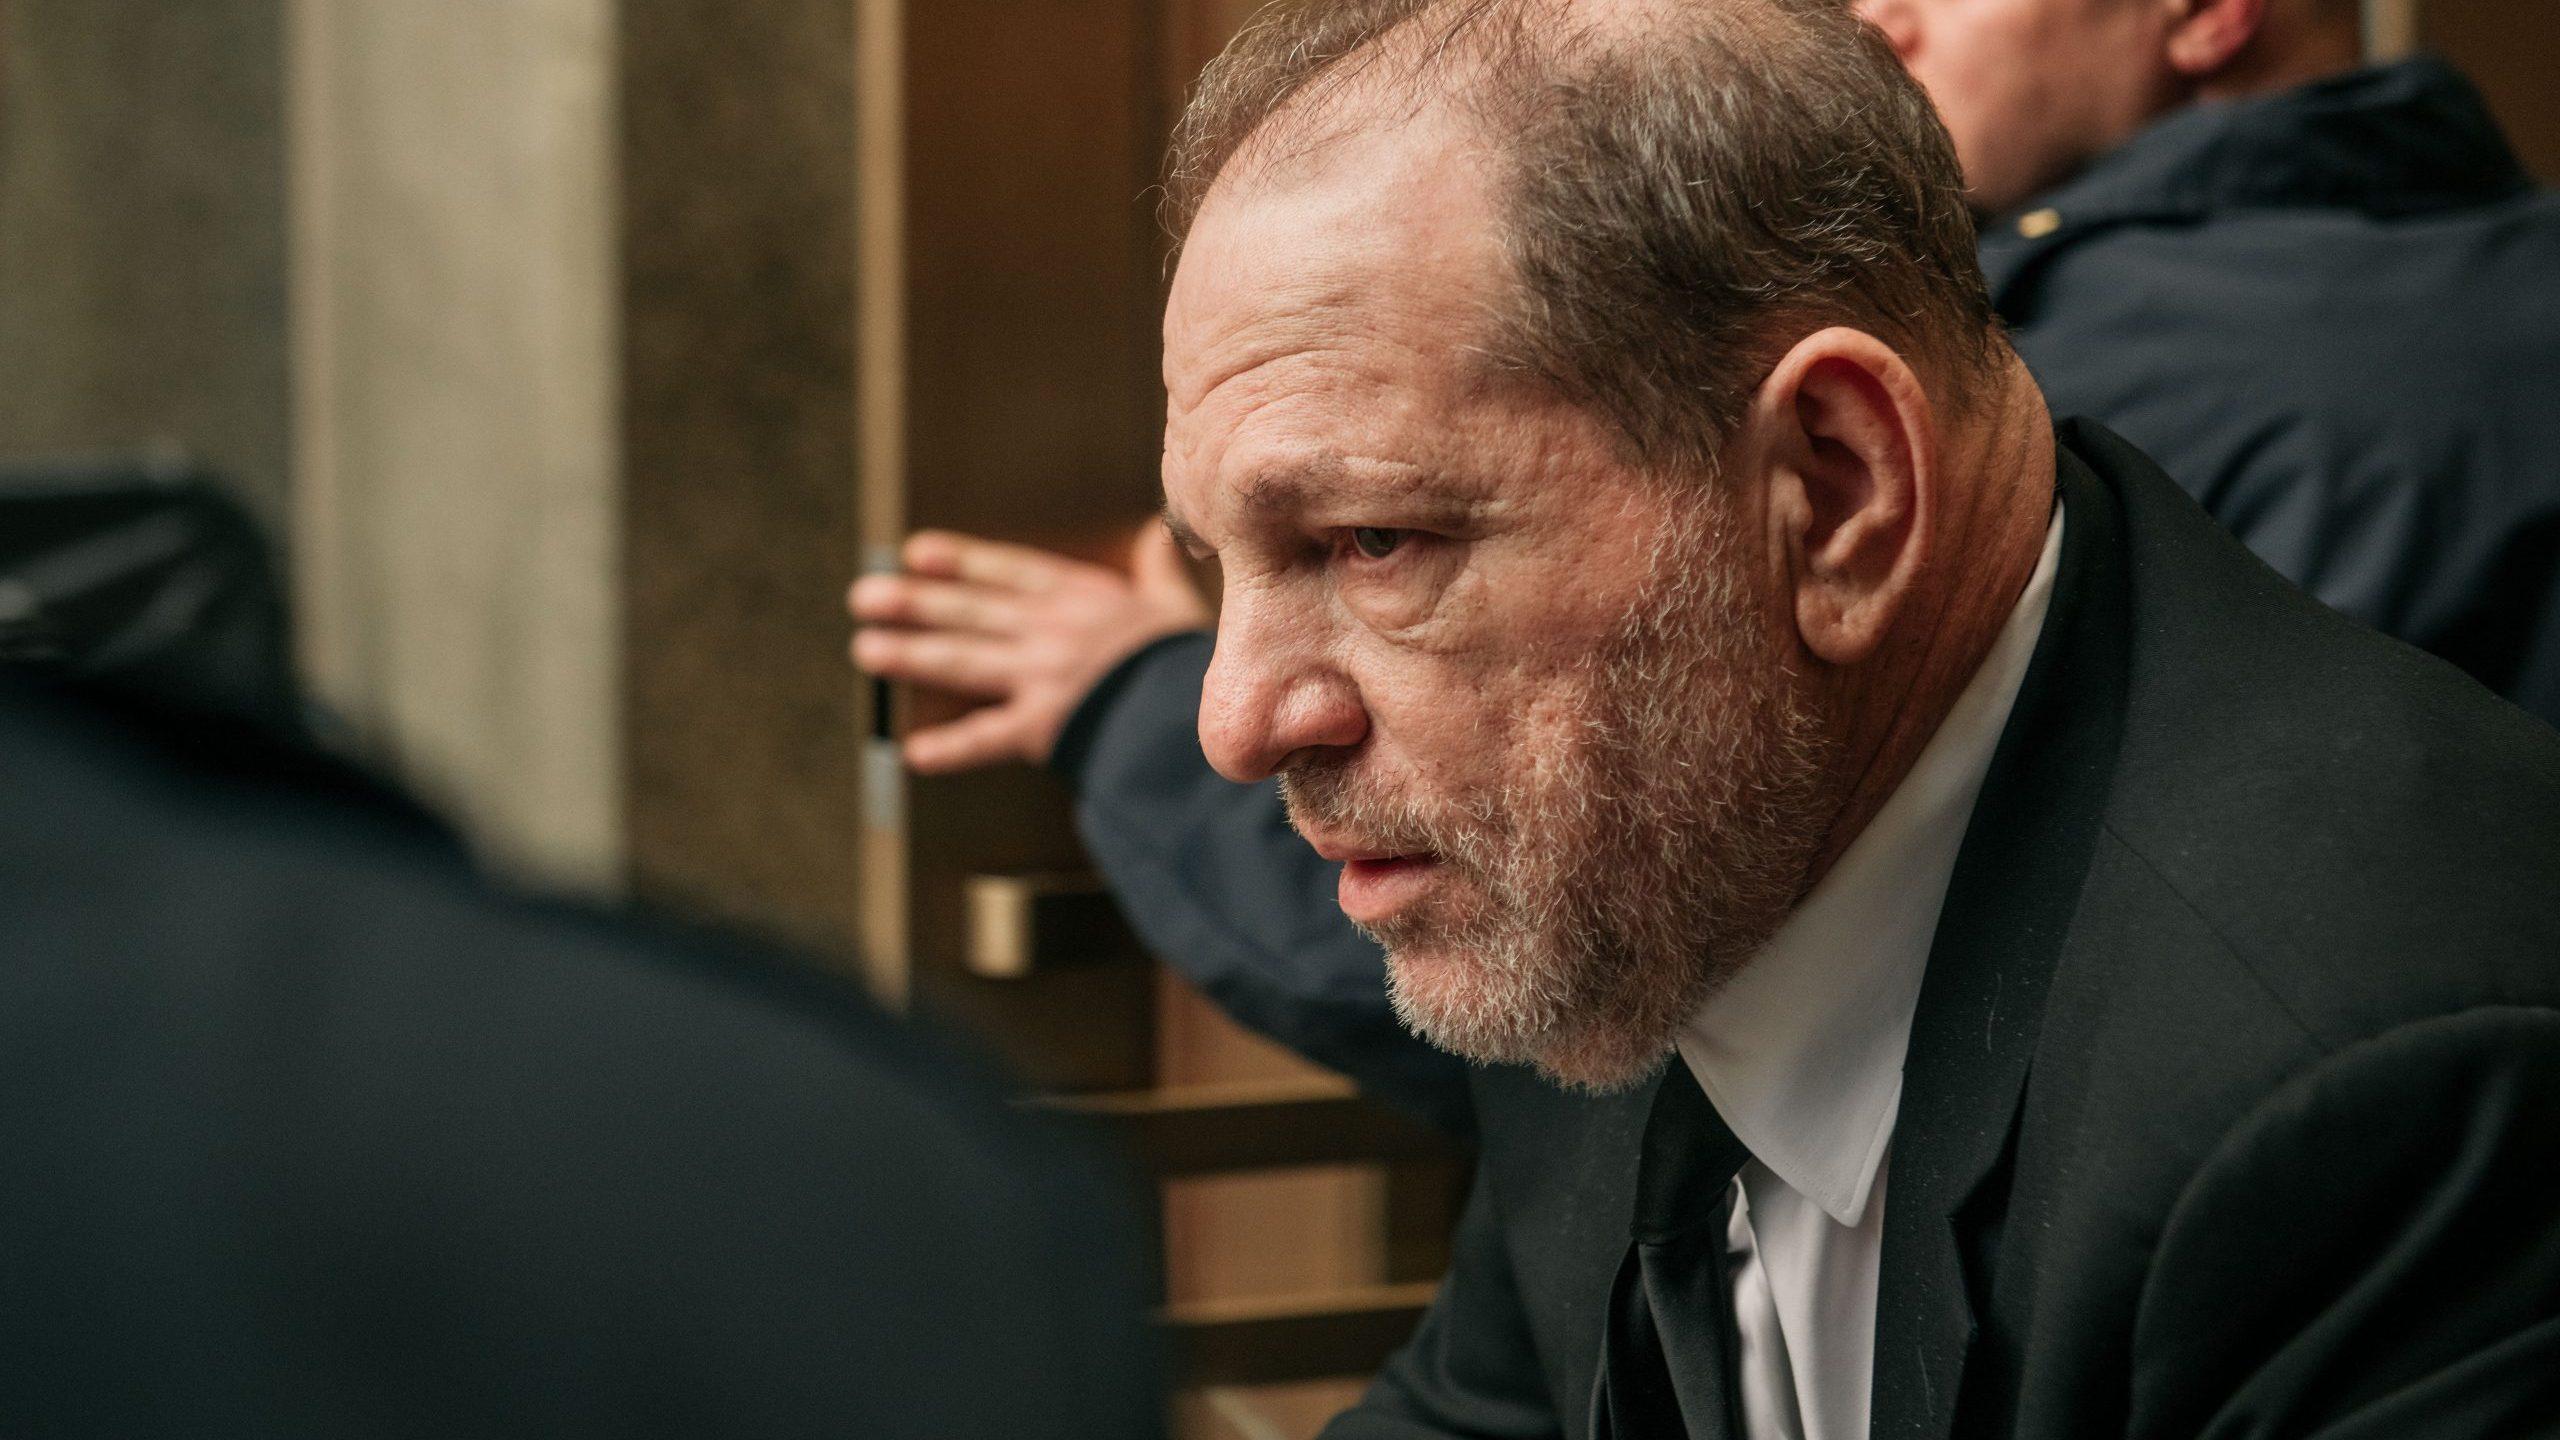 Harvey Weinstein leaves New York City Criminal Court on Jan. 16, 2020 in New York City. (Credit: Scott Heins/Getty Images)